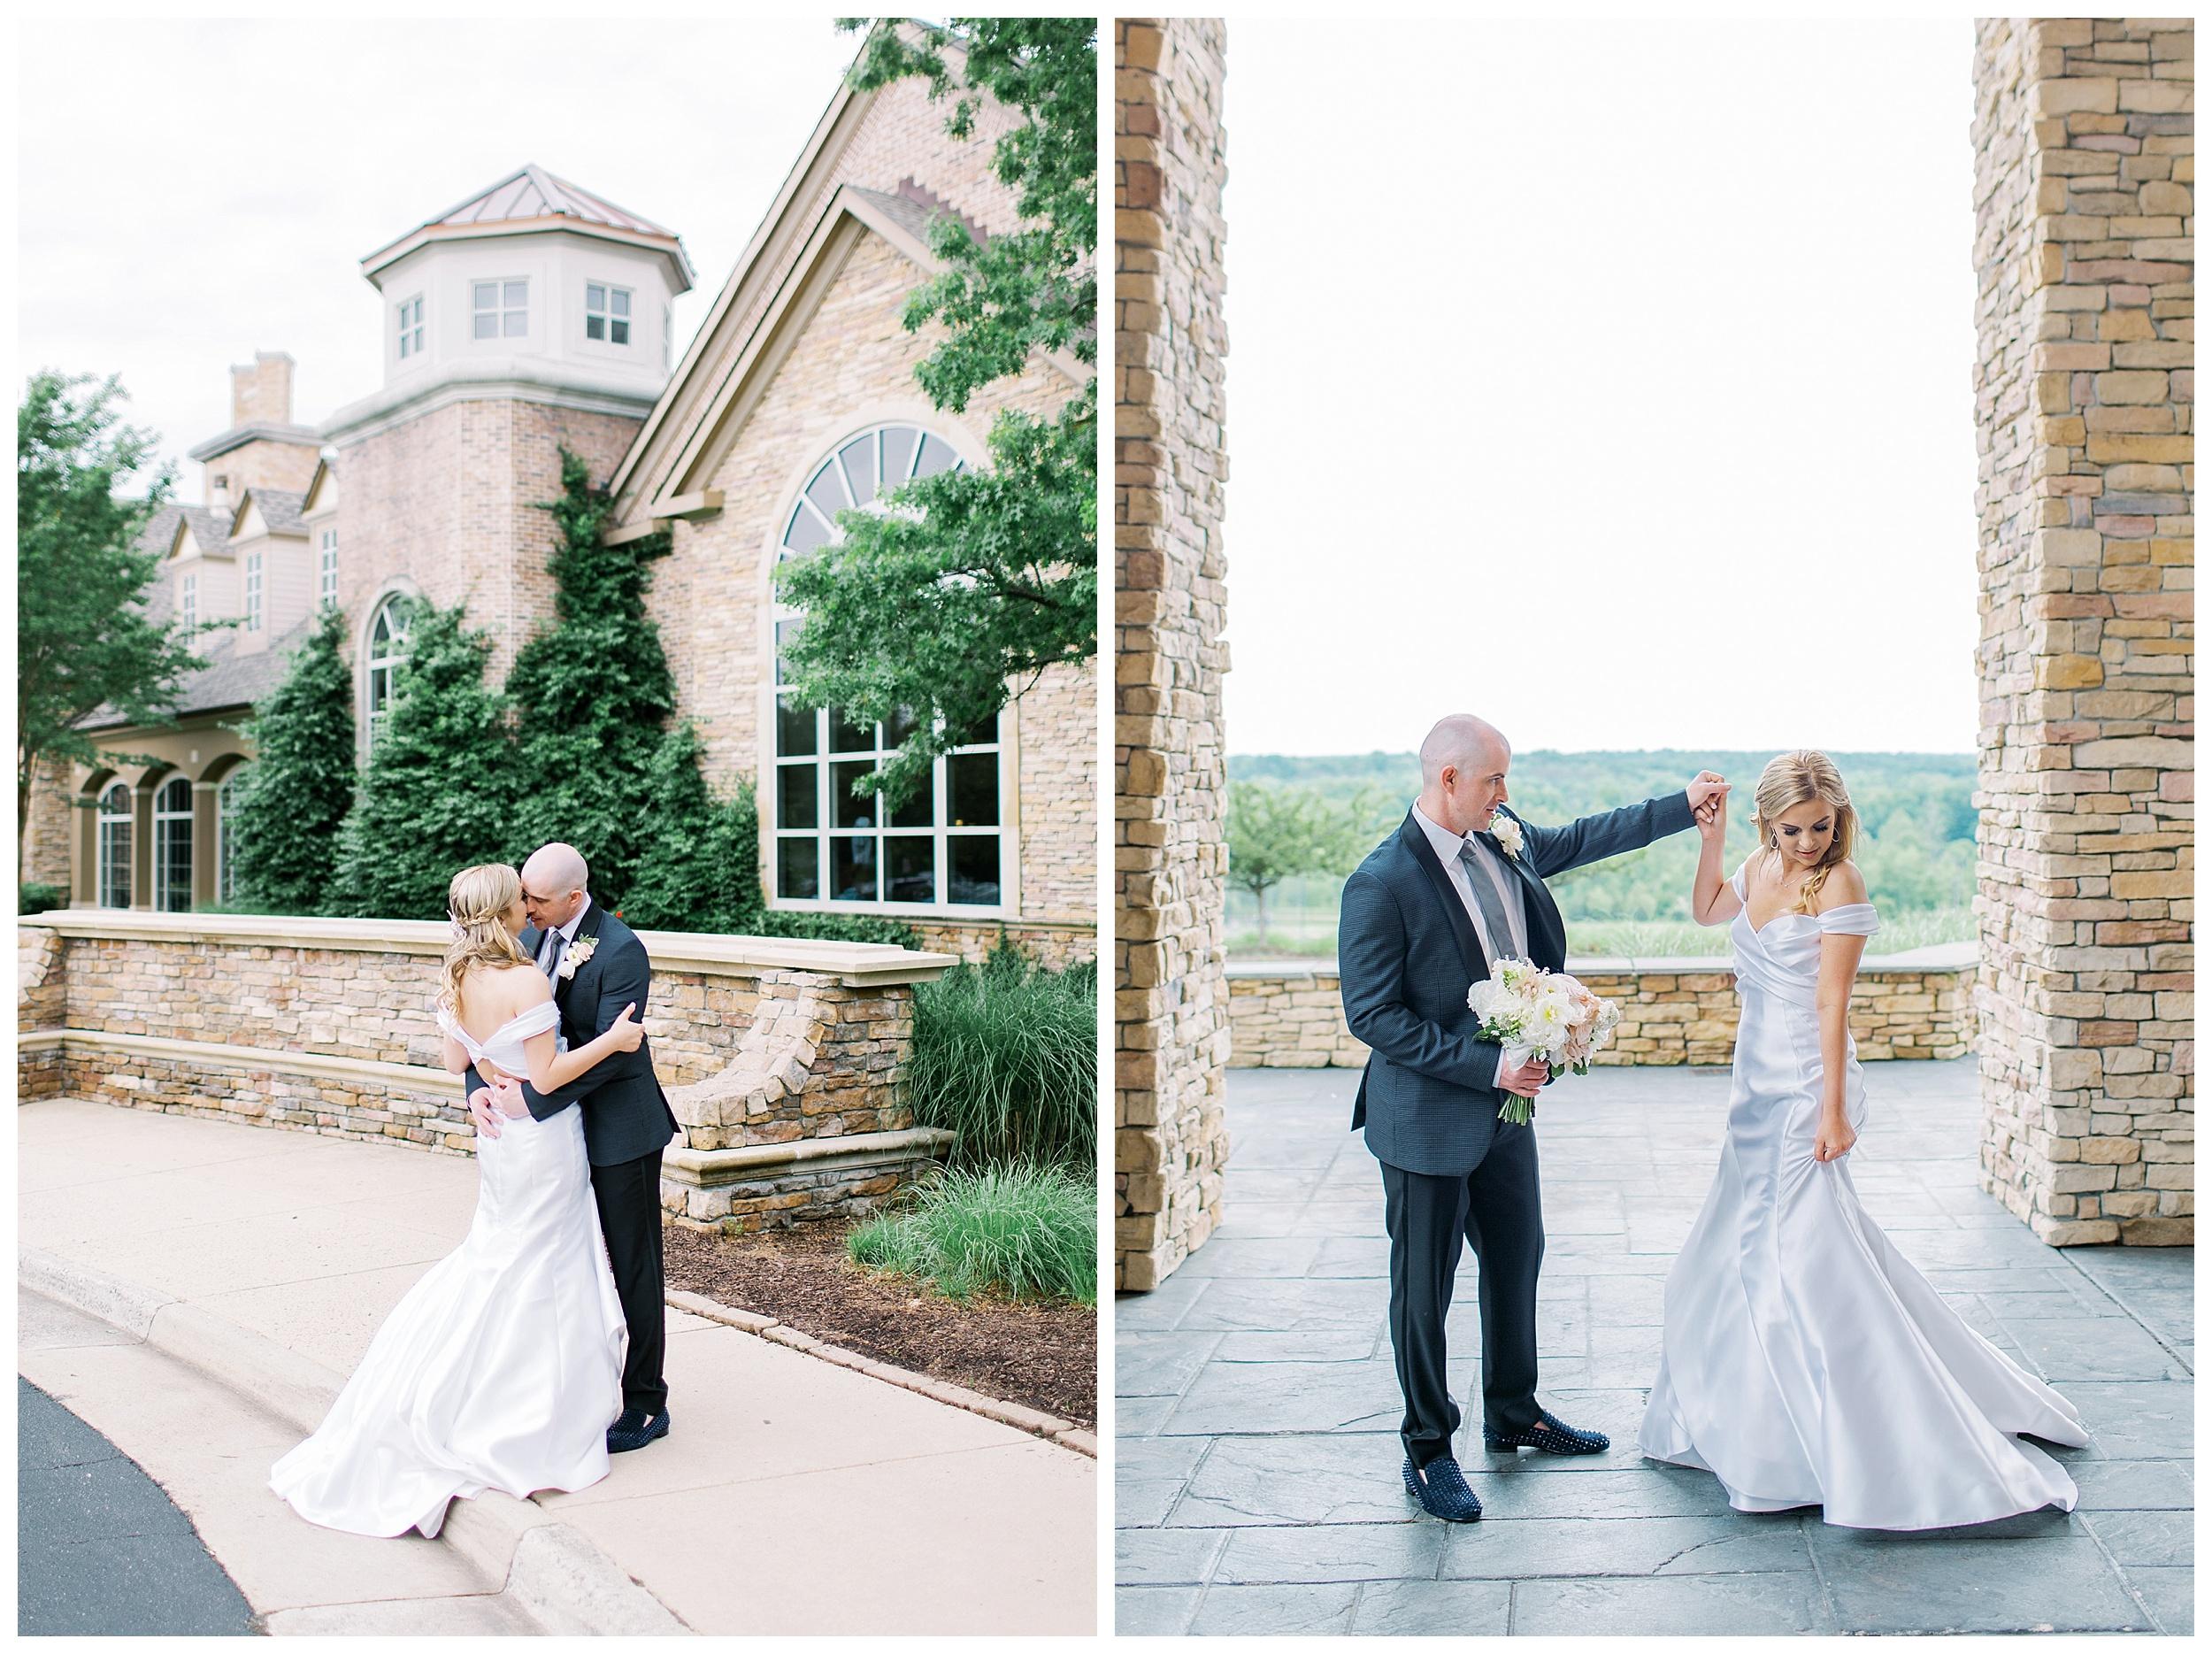 Lansdowne Resort Wedding | Virginia Film Wedding Photographer Kir Tuben_0050.jpg